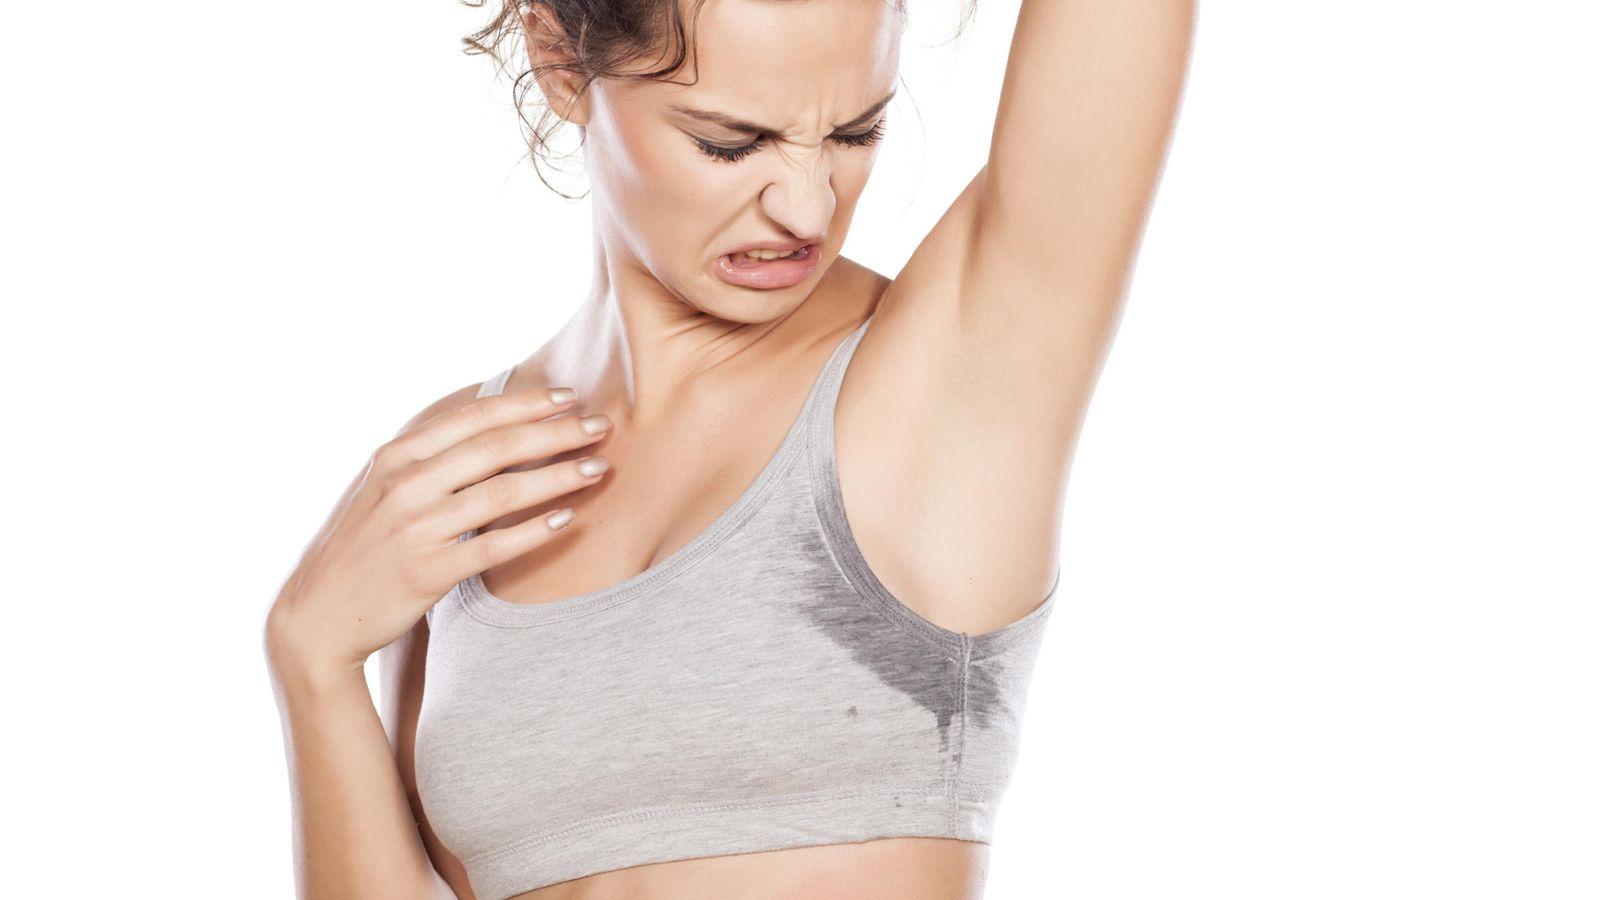 Higiene Usas Mal El Desodorante Te Lo Estas Aplicando Por La